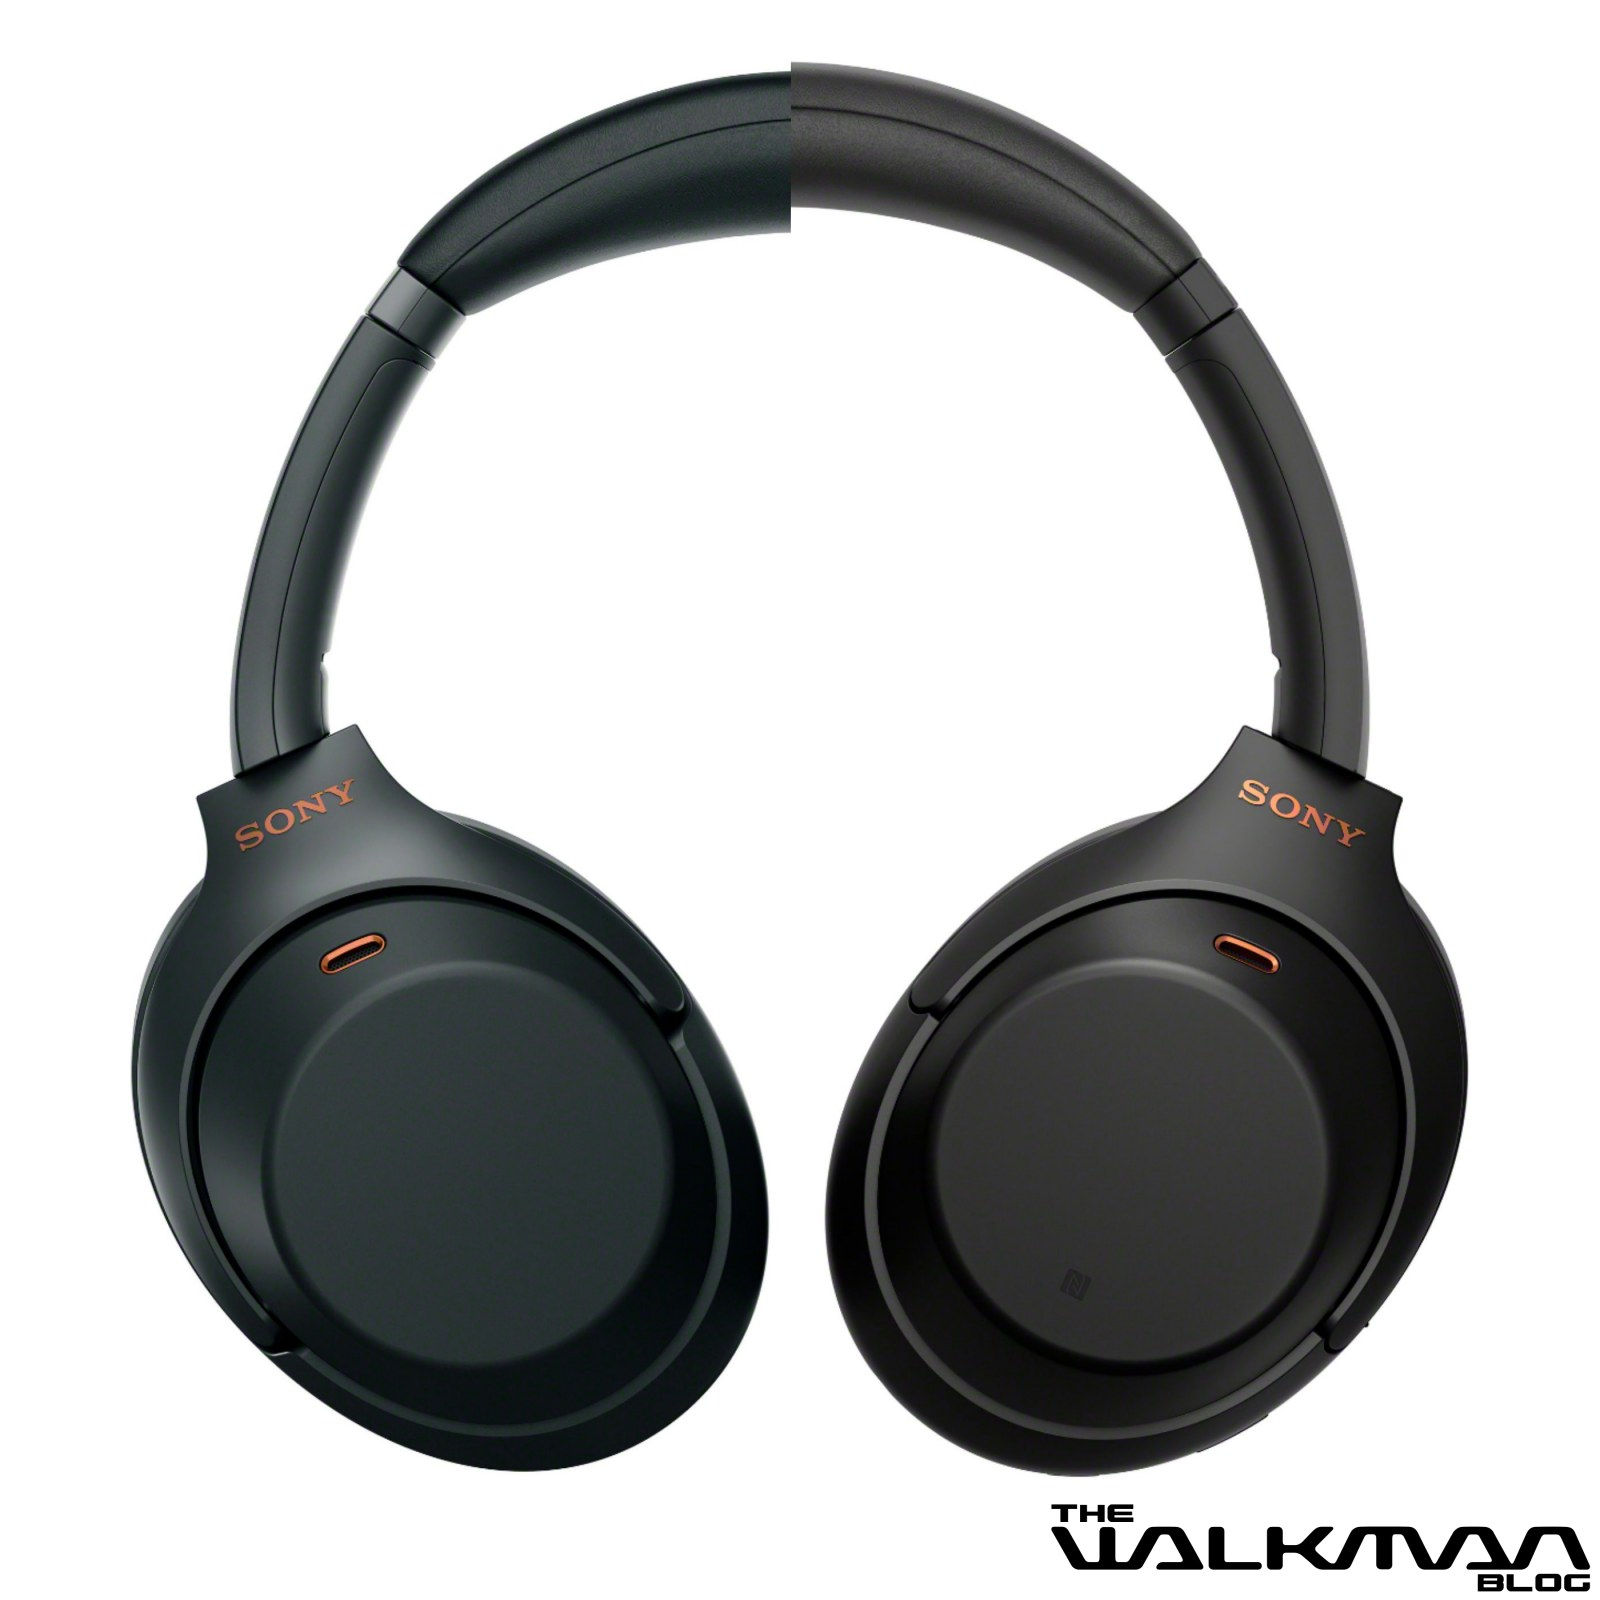 Sony WH-1000XM4 in Midnight Blue? - The Walkman Blog